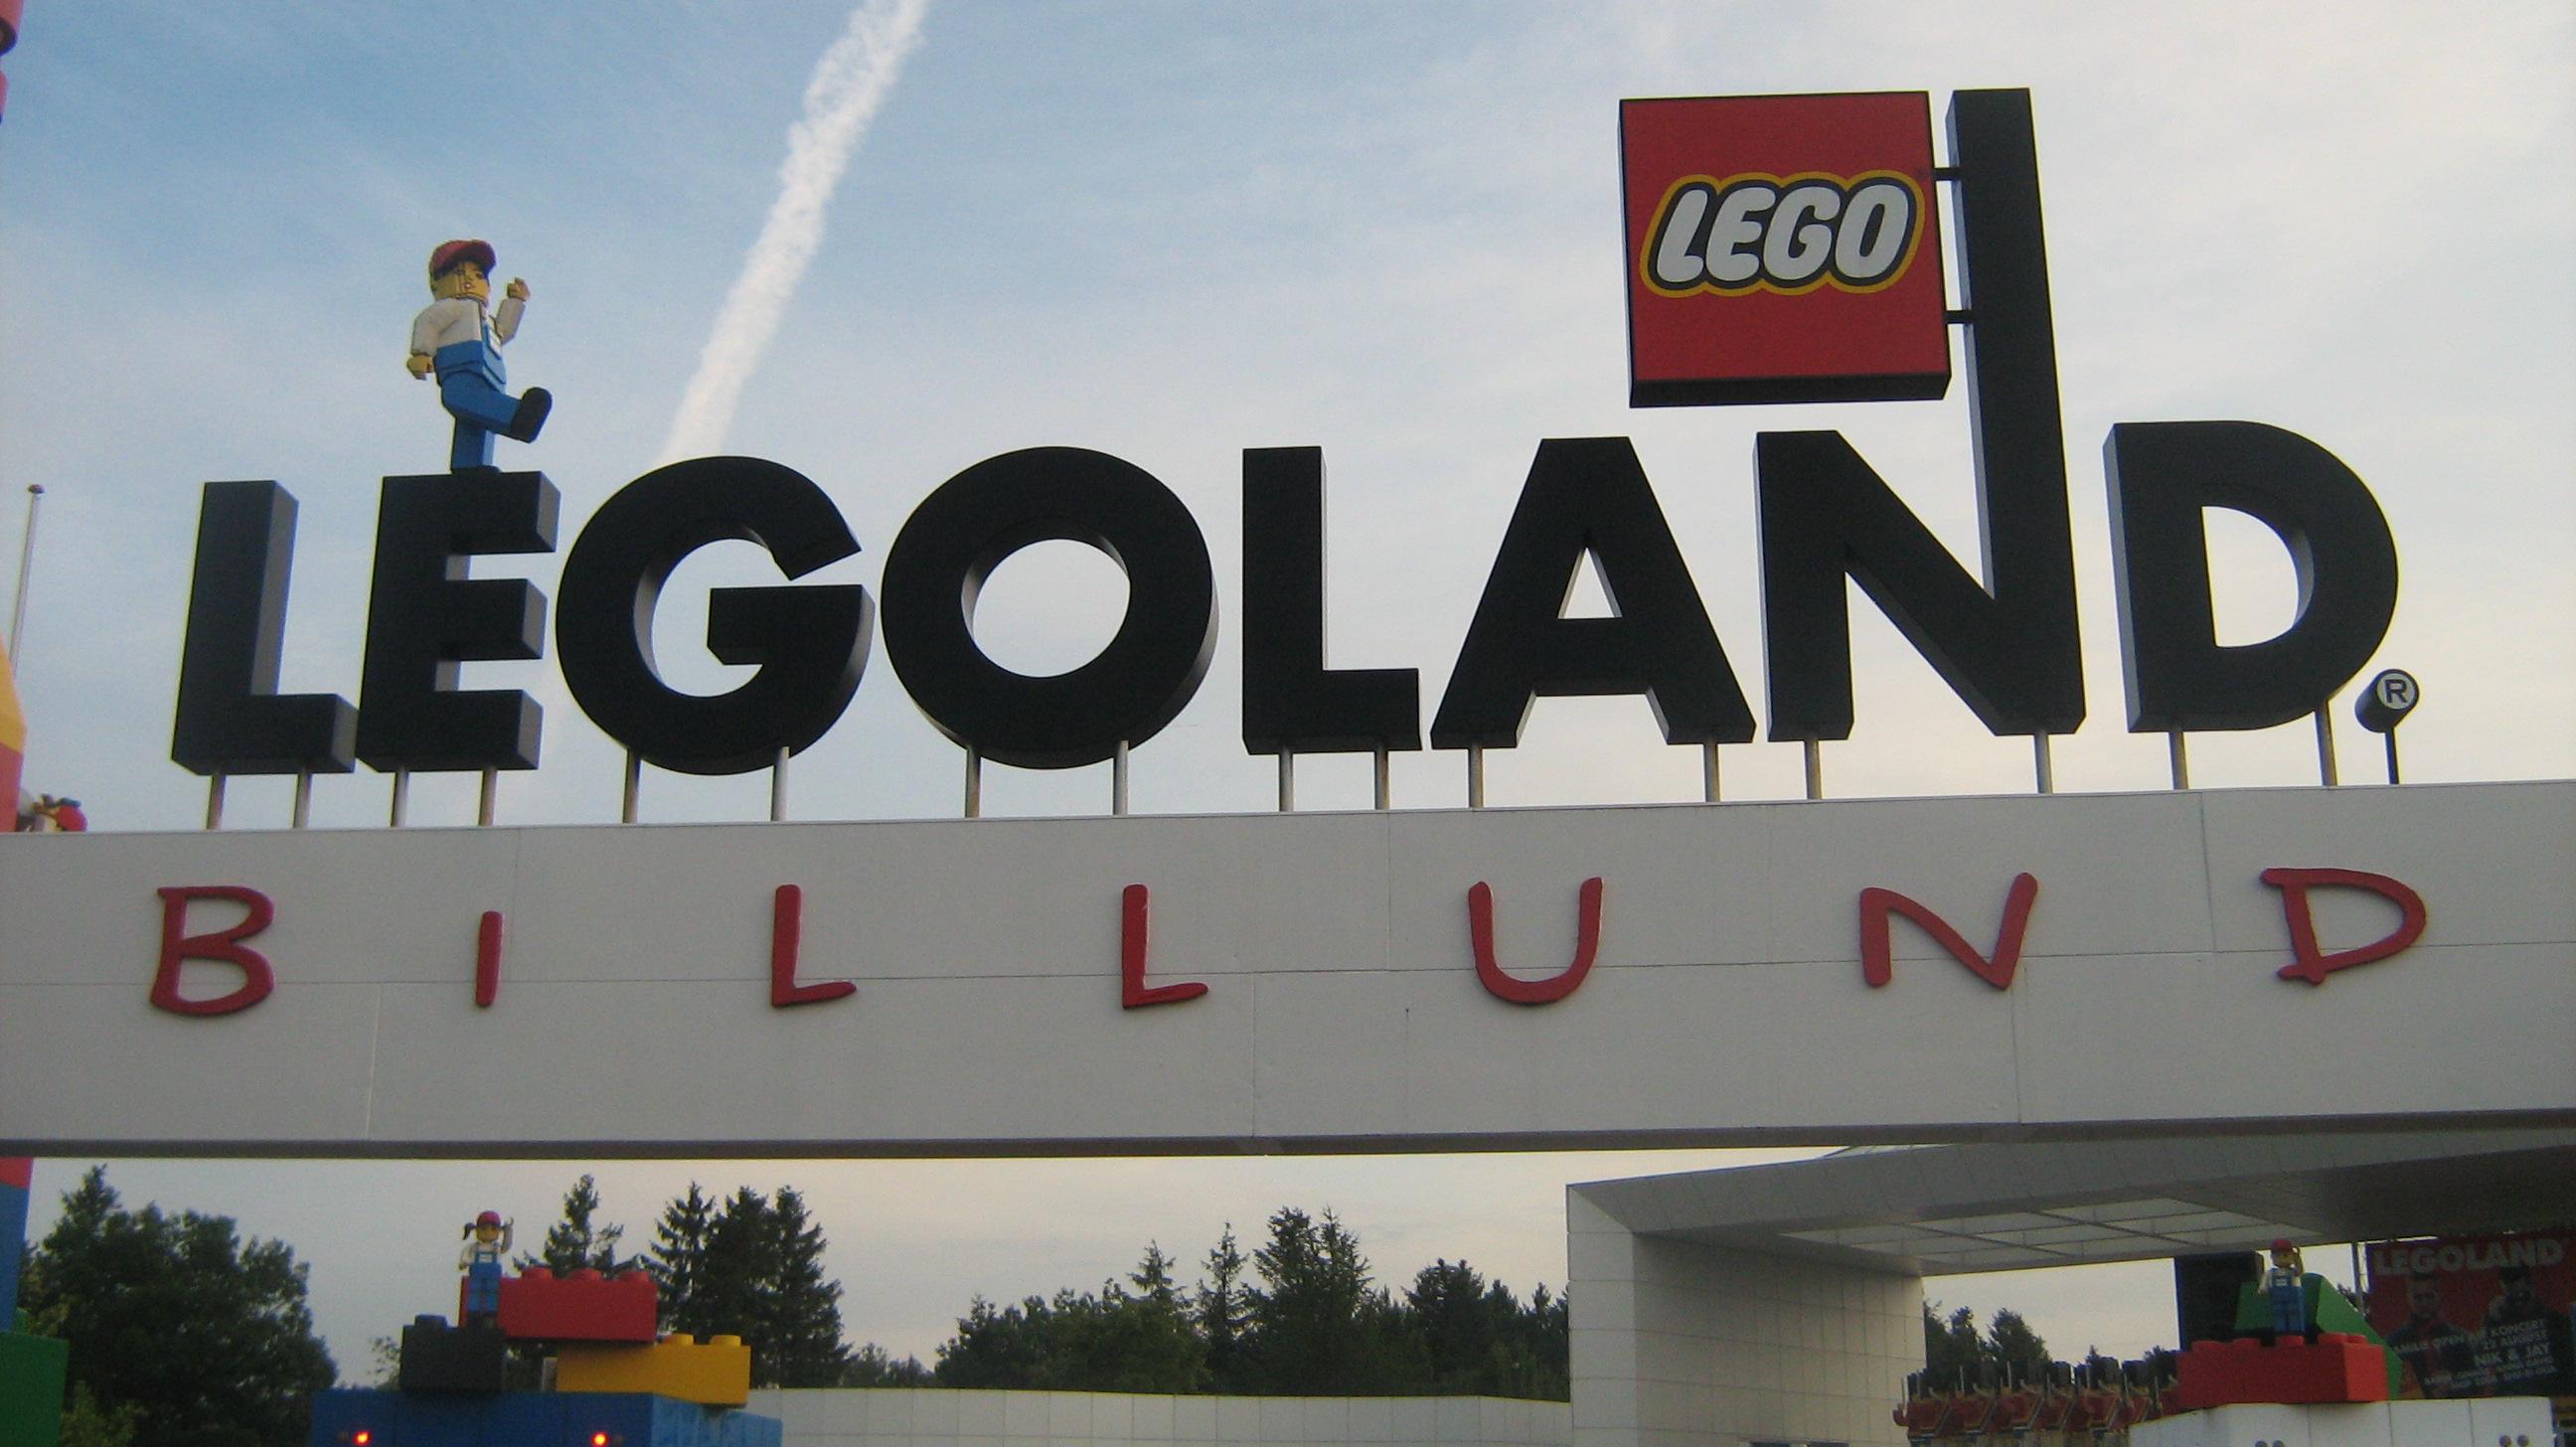 Legoland-Billund